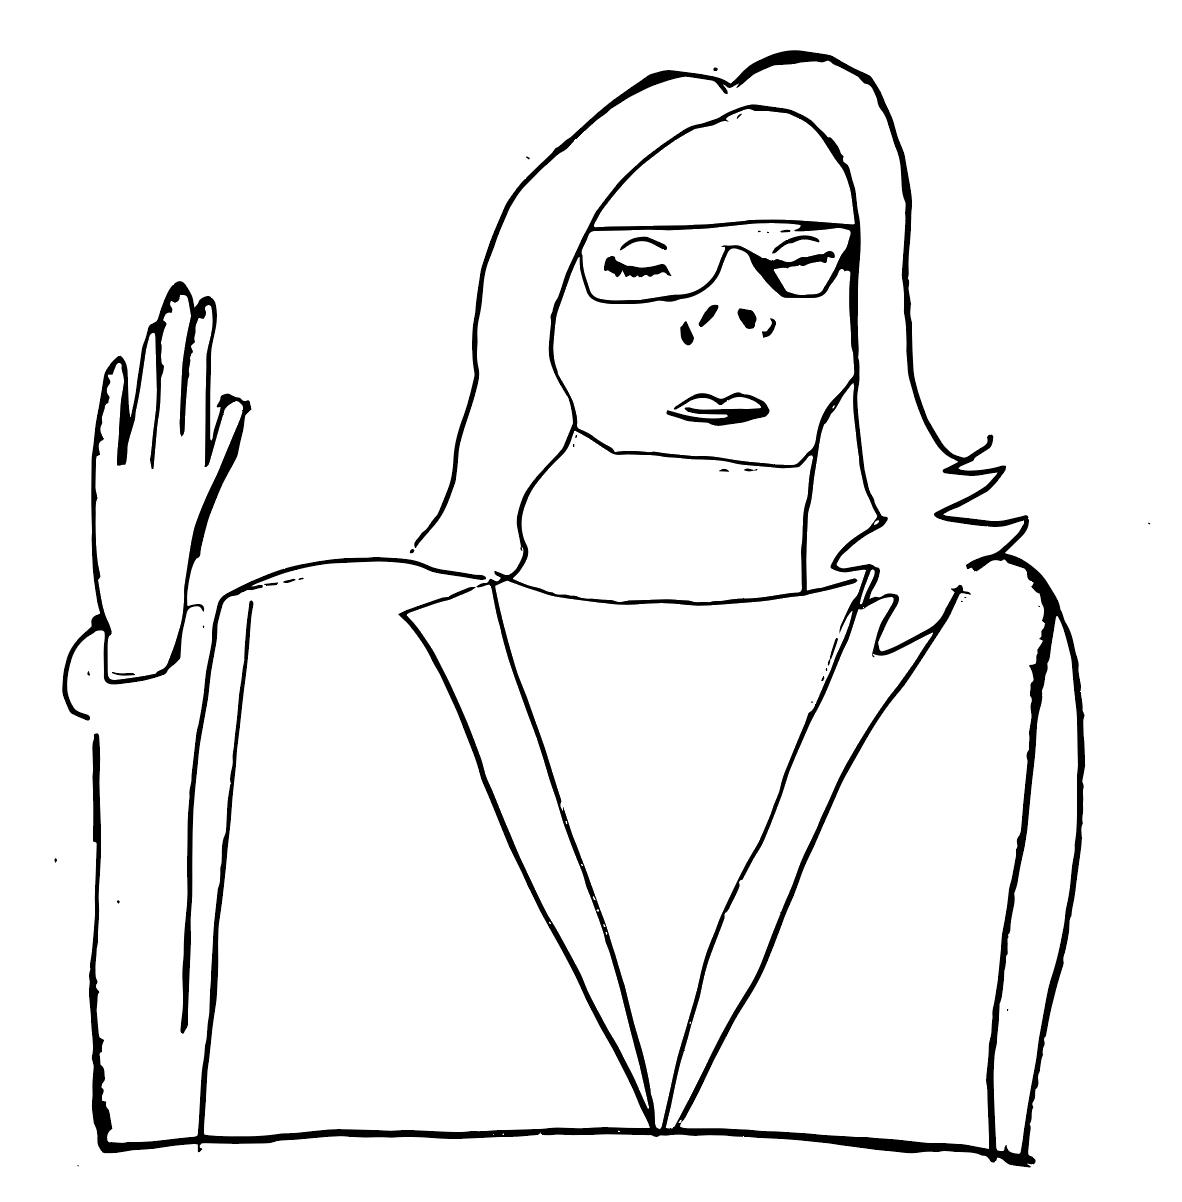 Illustration of Christine Blasey-Ford testifying before Congress, by Zella Lezak, Staff Writer